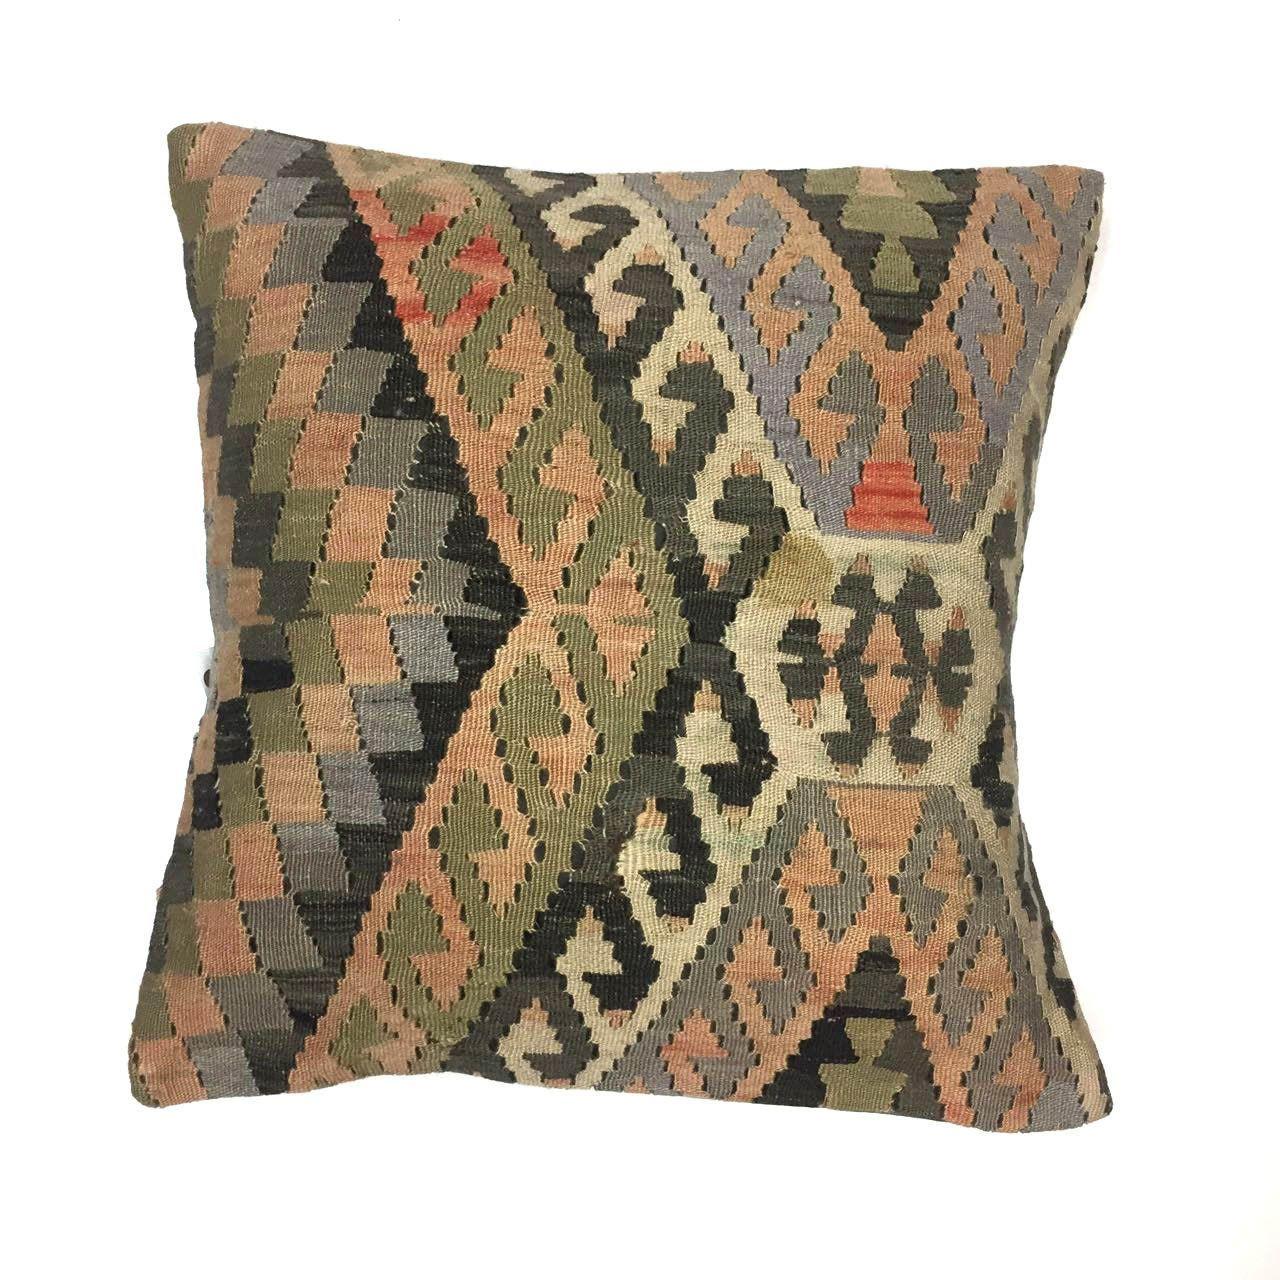 60x60cm Kilim Cushions Kelim Pillows in